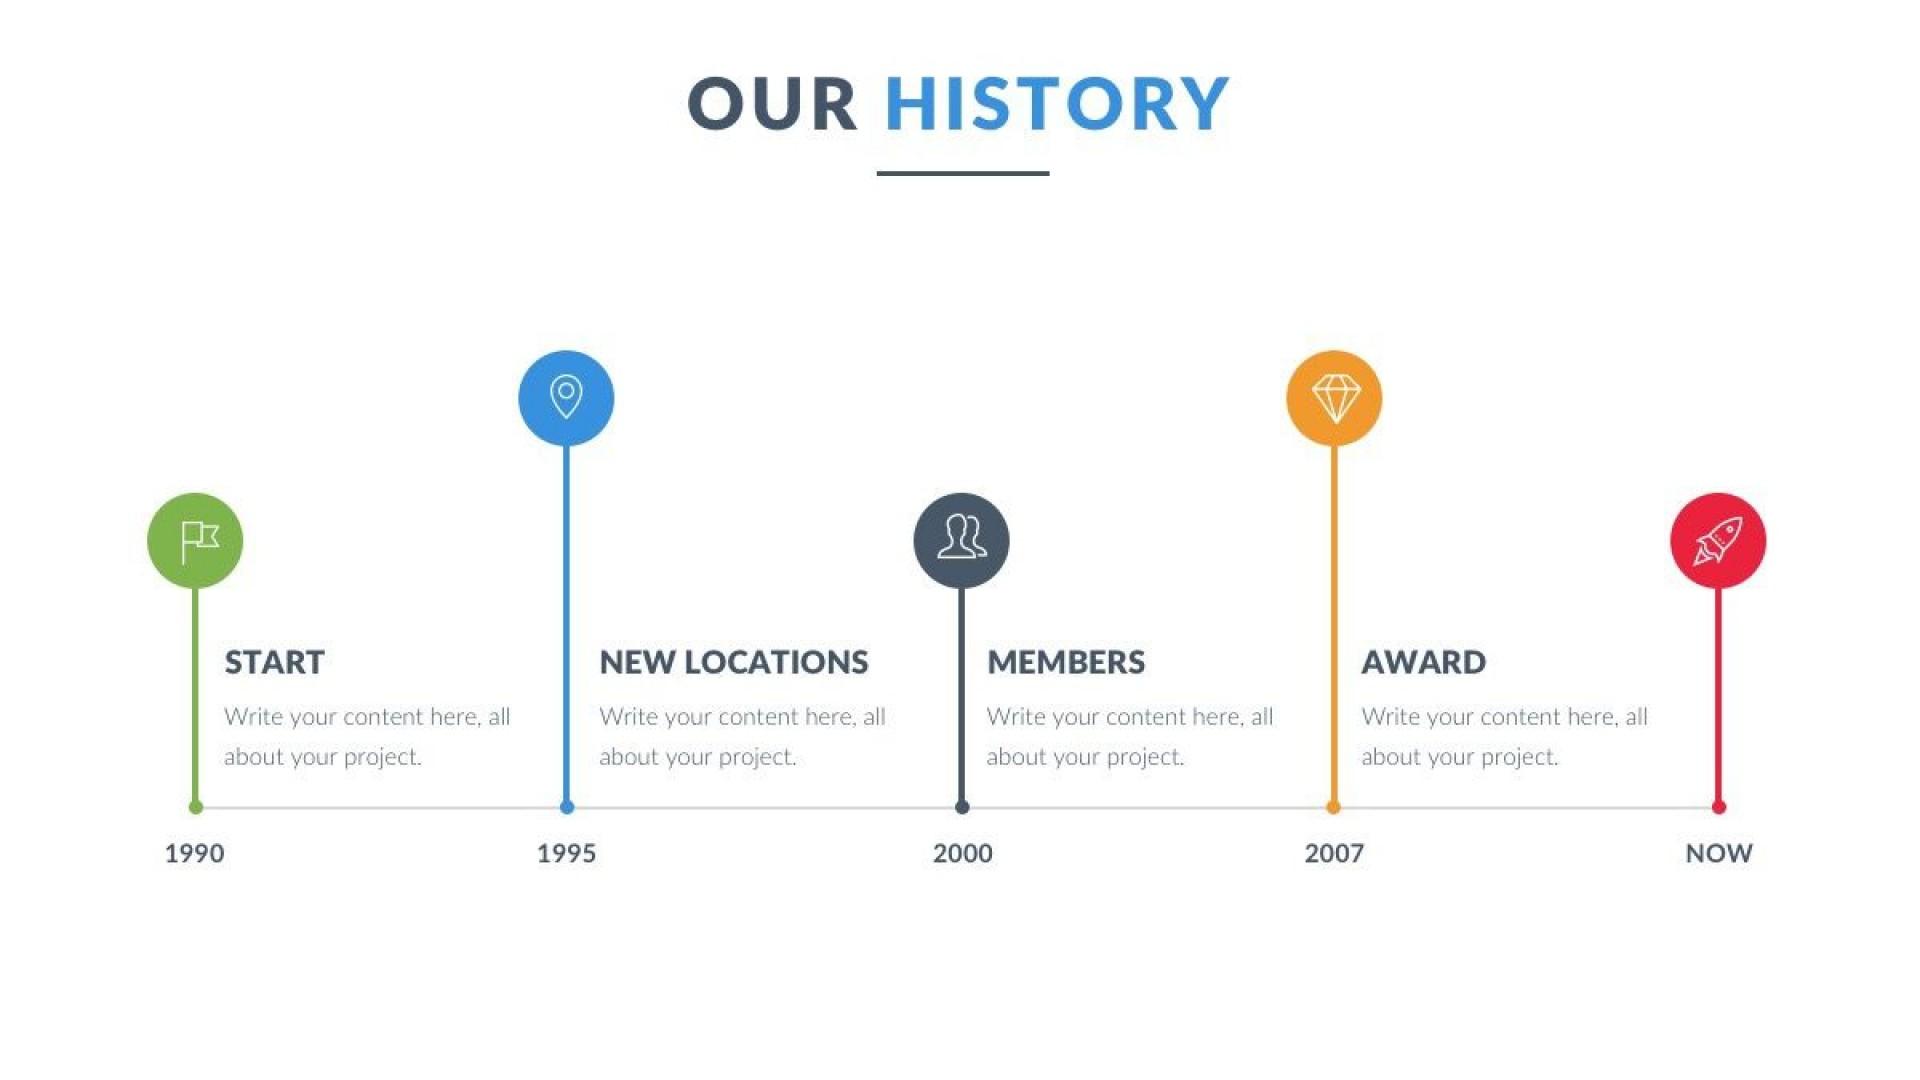 009 Impressive Timeline Template For Ppt Free Concept  Infographic Vertical Download1920